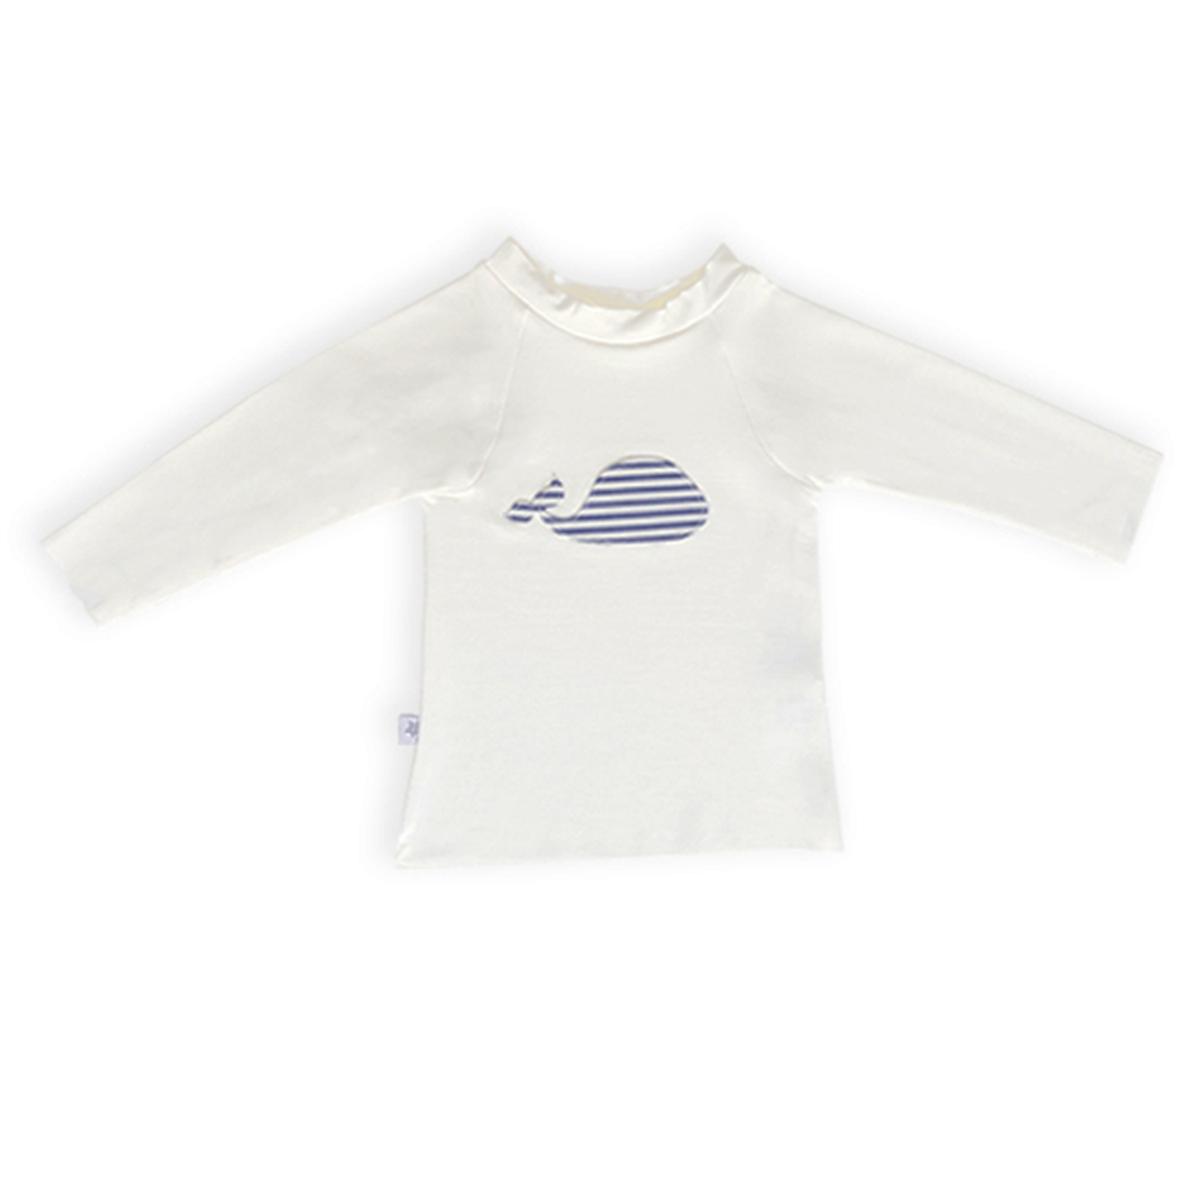 Haut bébé Tee-Shirt Anti-UV Marin Mousse - 12 Mois Tee-Shirt Anti-UV Marin Mousse - 12 Mois